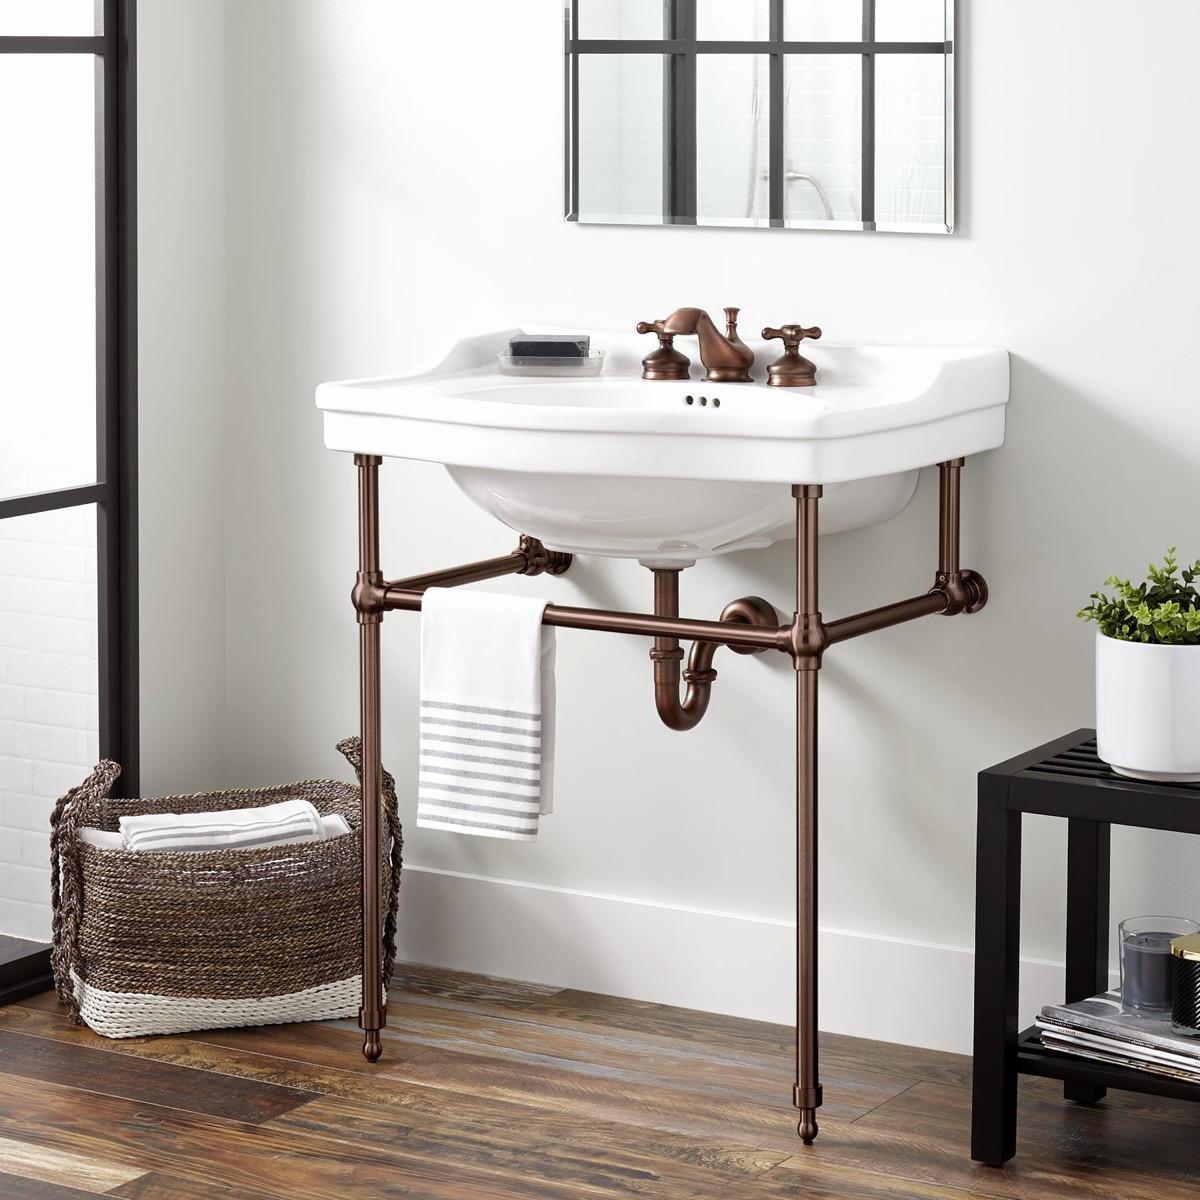 Narrow Depth Bathroom Vanity Sale Fresh Cierra Console Sink With Brass Stand Bathroom Awesome Decors